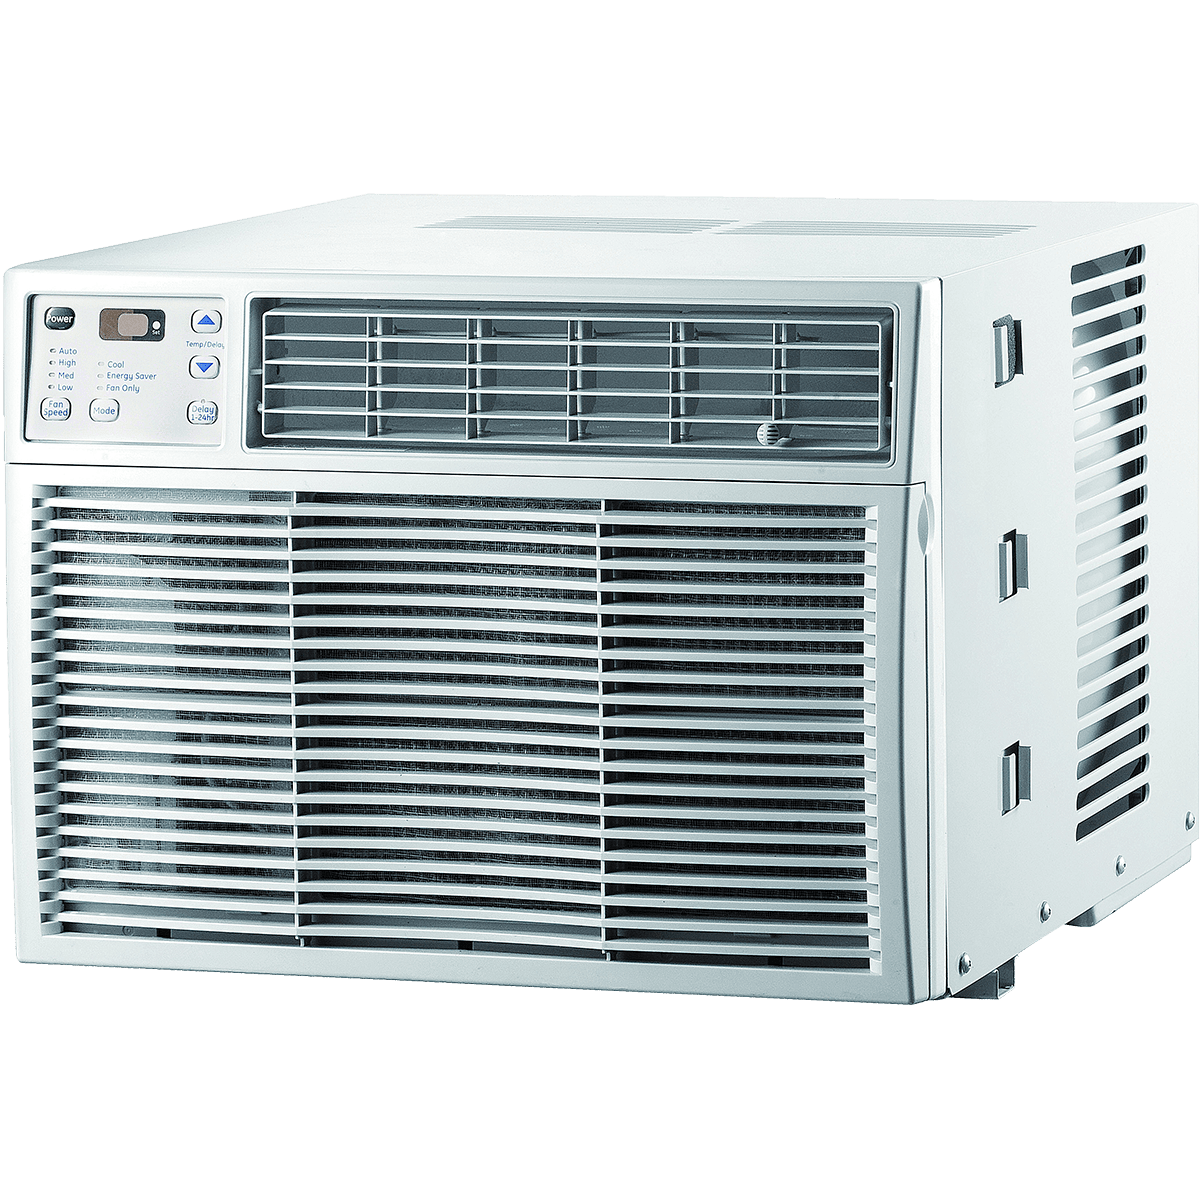 Gree 10,000 BTU Window Air Conditioner (G15-10ESCVWAC) gr6284